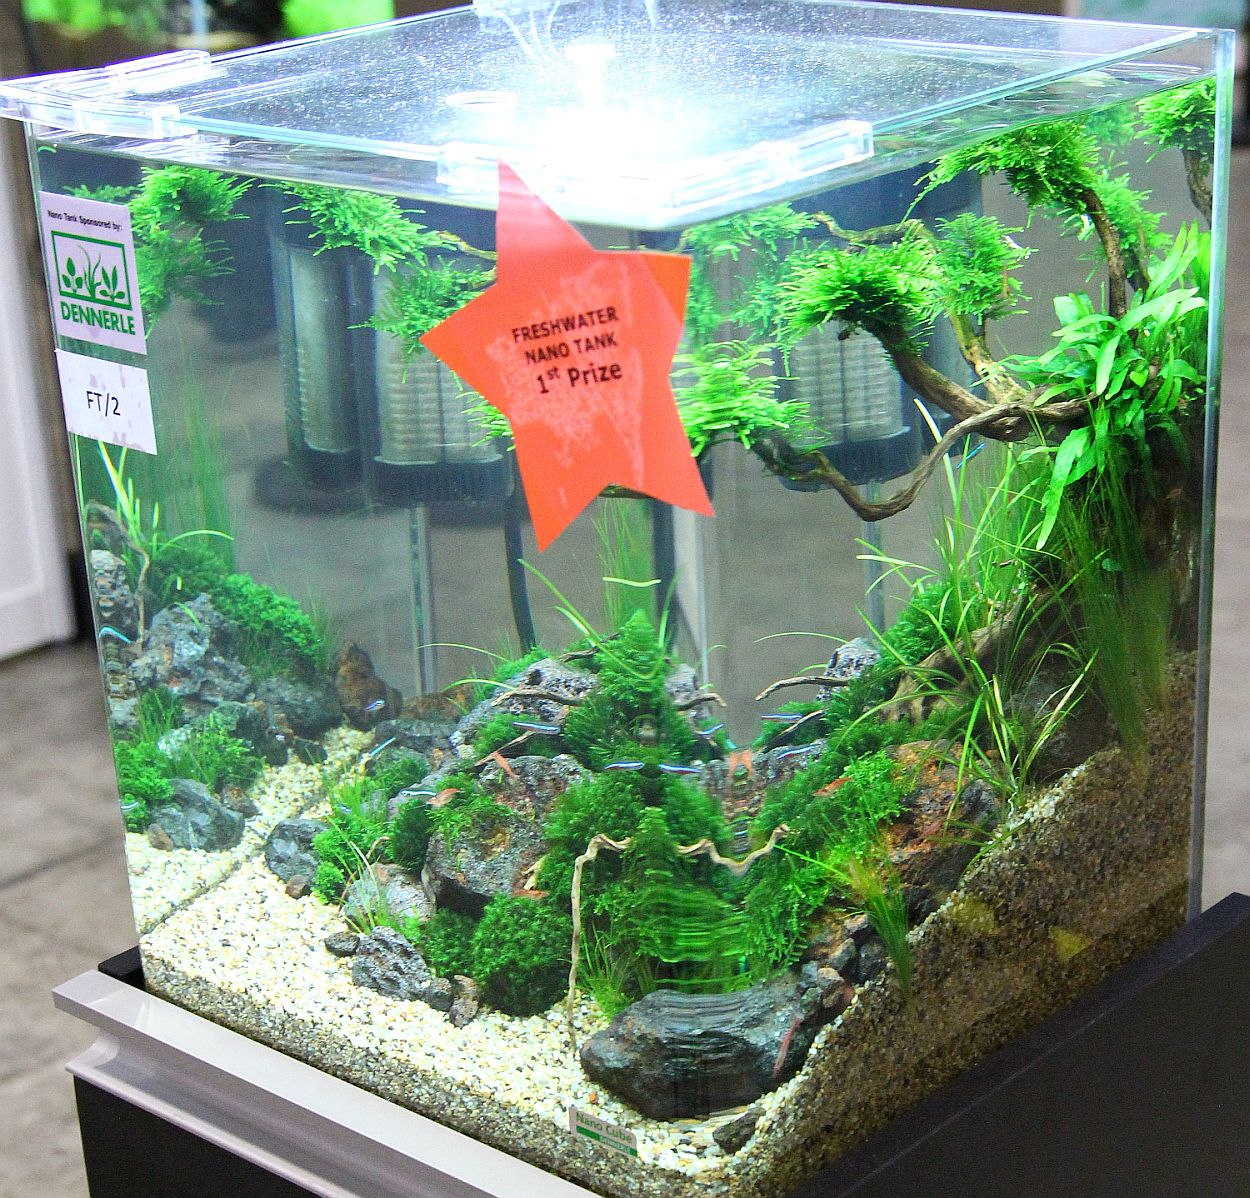 Aquarium nano fish tank - Freshwater Nano Tank 1st Prize